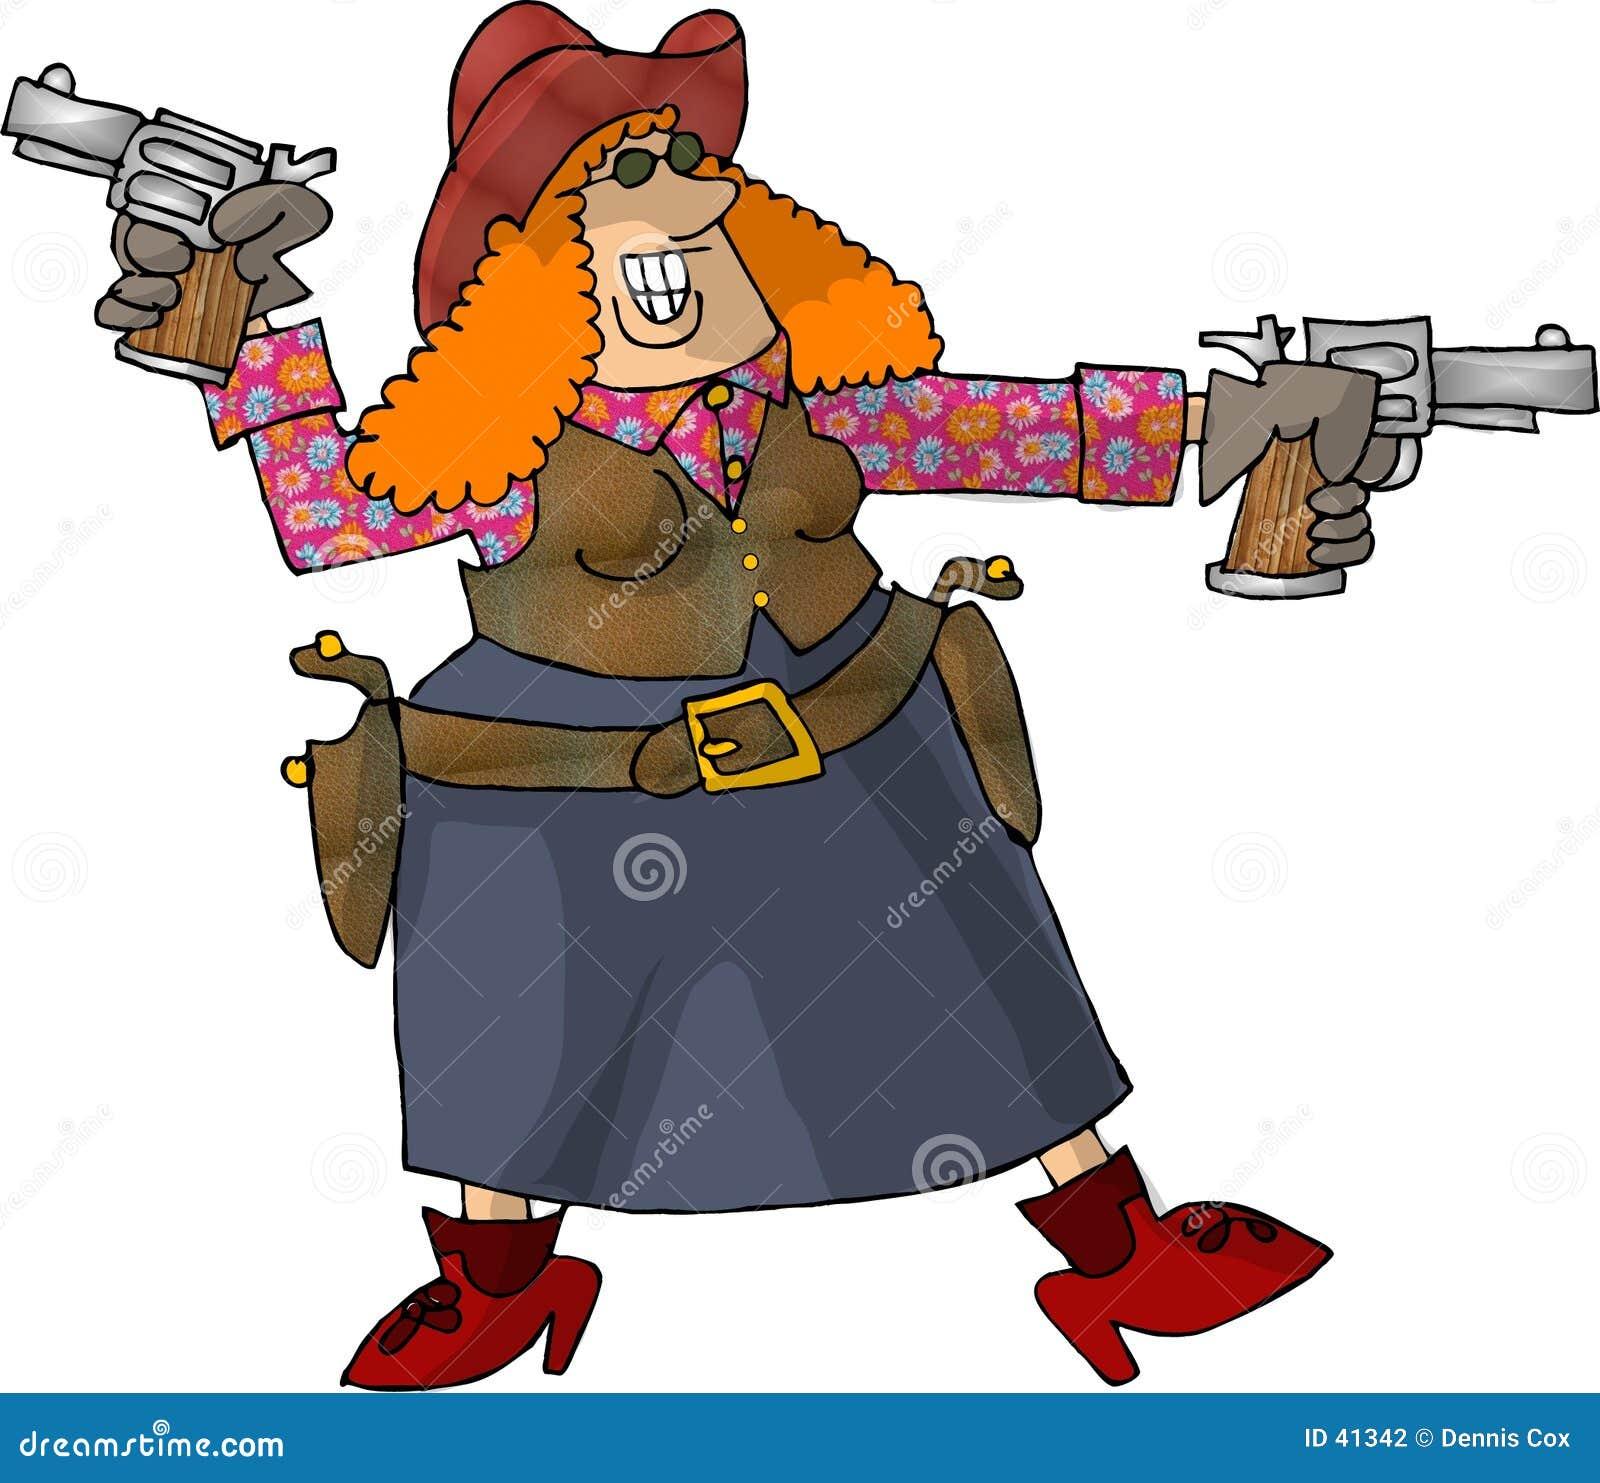 Kowbojka 2 strzelca 6